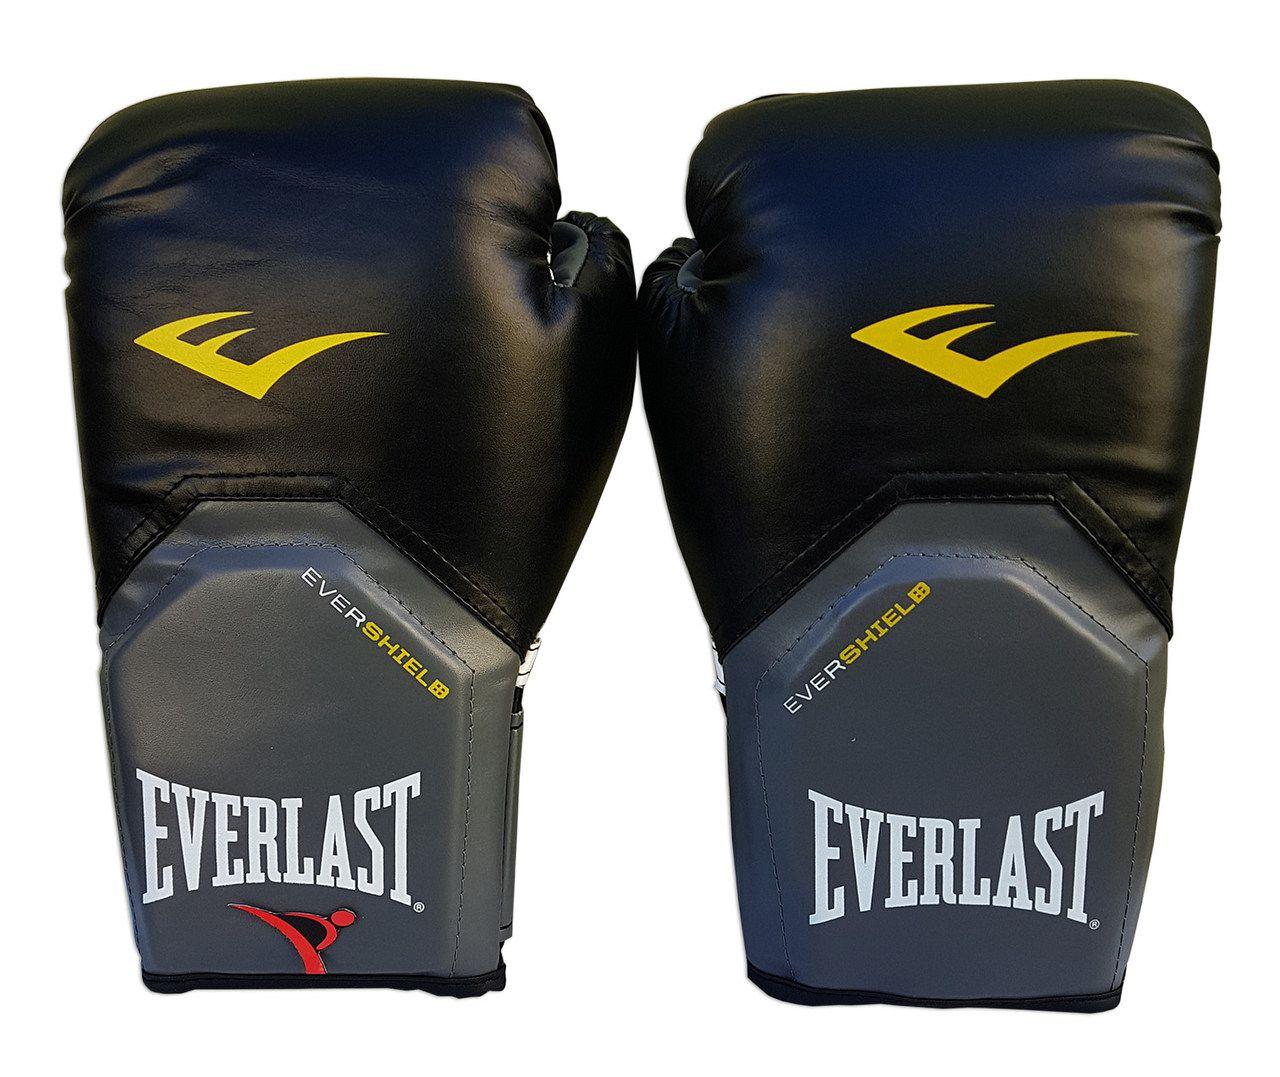 Kit de Boxe / Muay Thai 14oz - Preto - Pro Style - Everlast  - PRALUTA SHOP